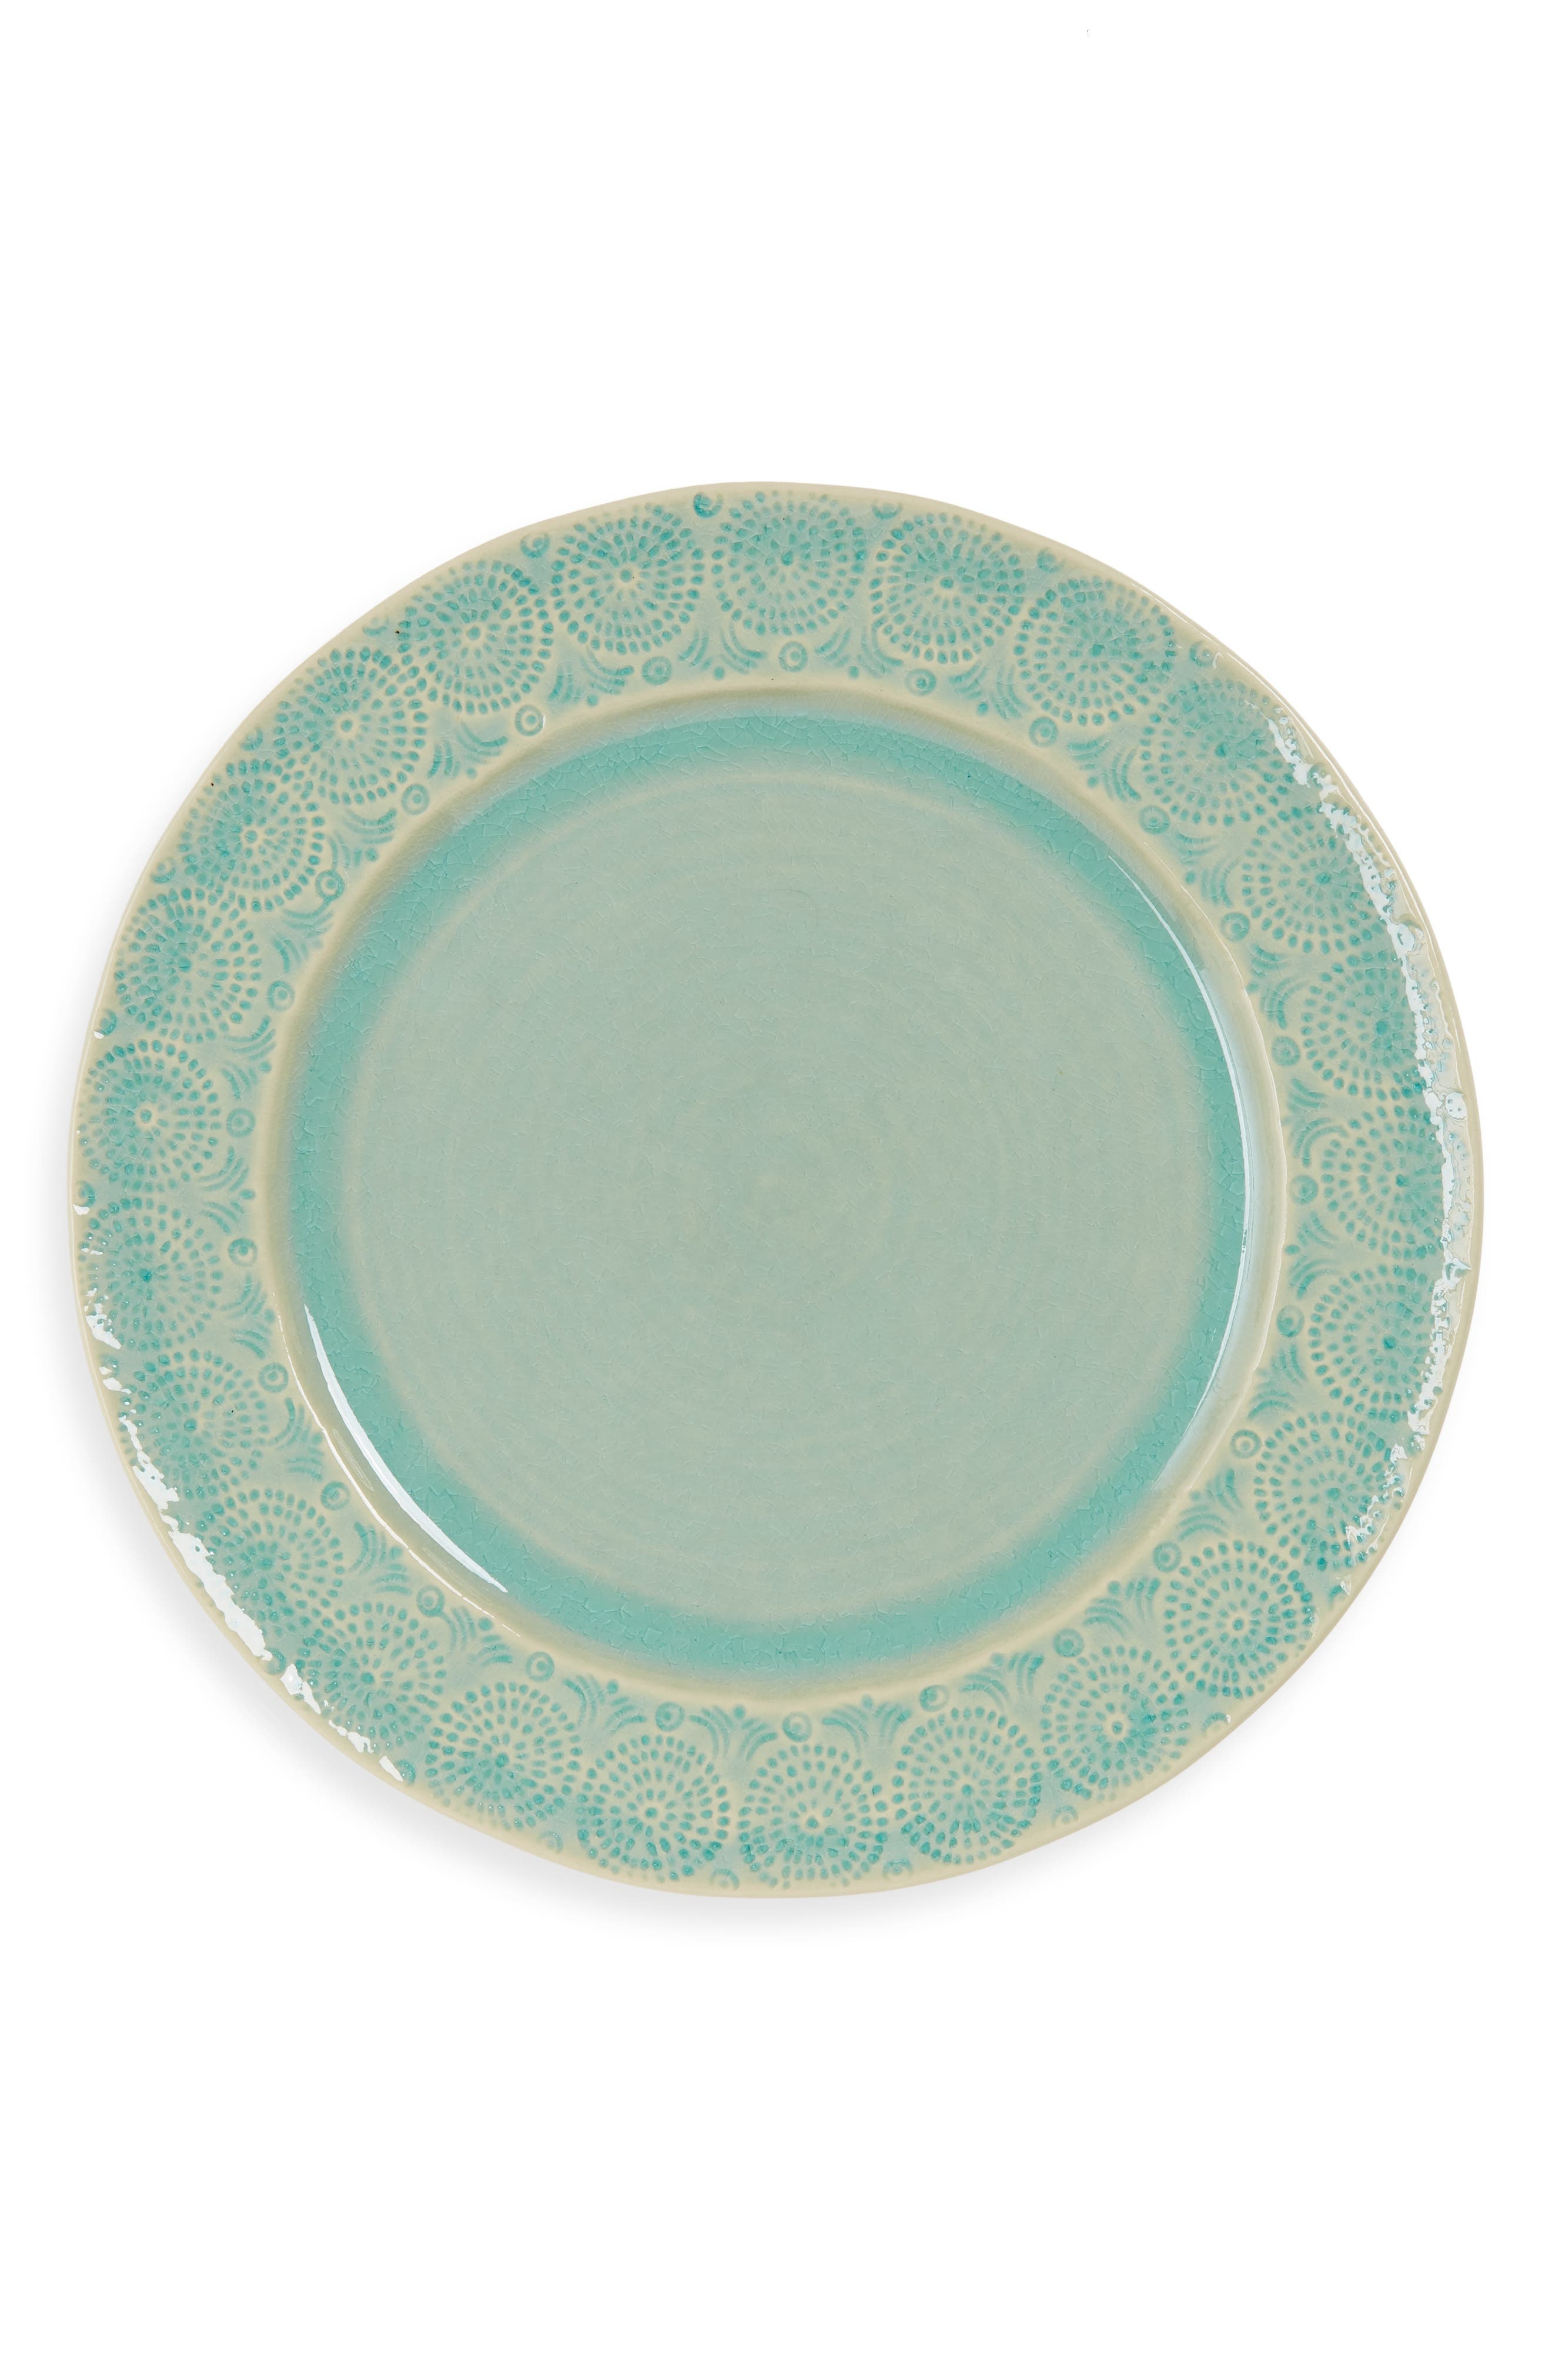 Old Havana Dinner Plate,                         Main,                         color, MINT